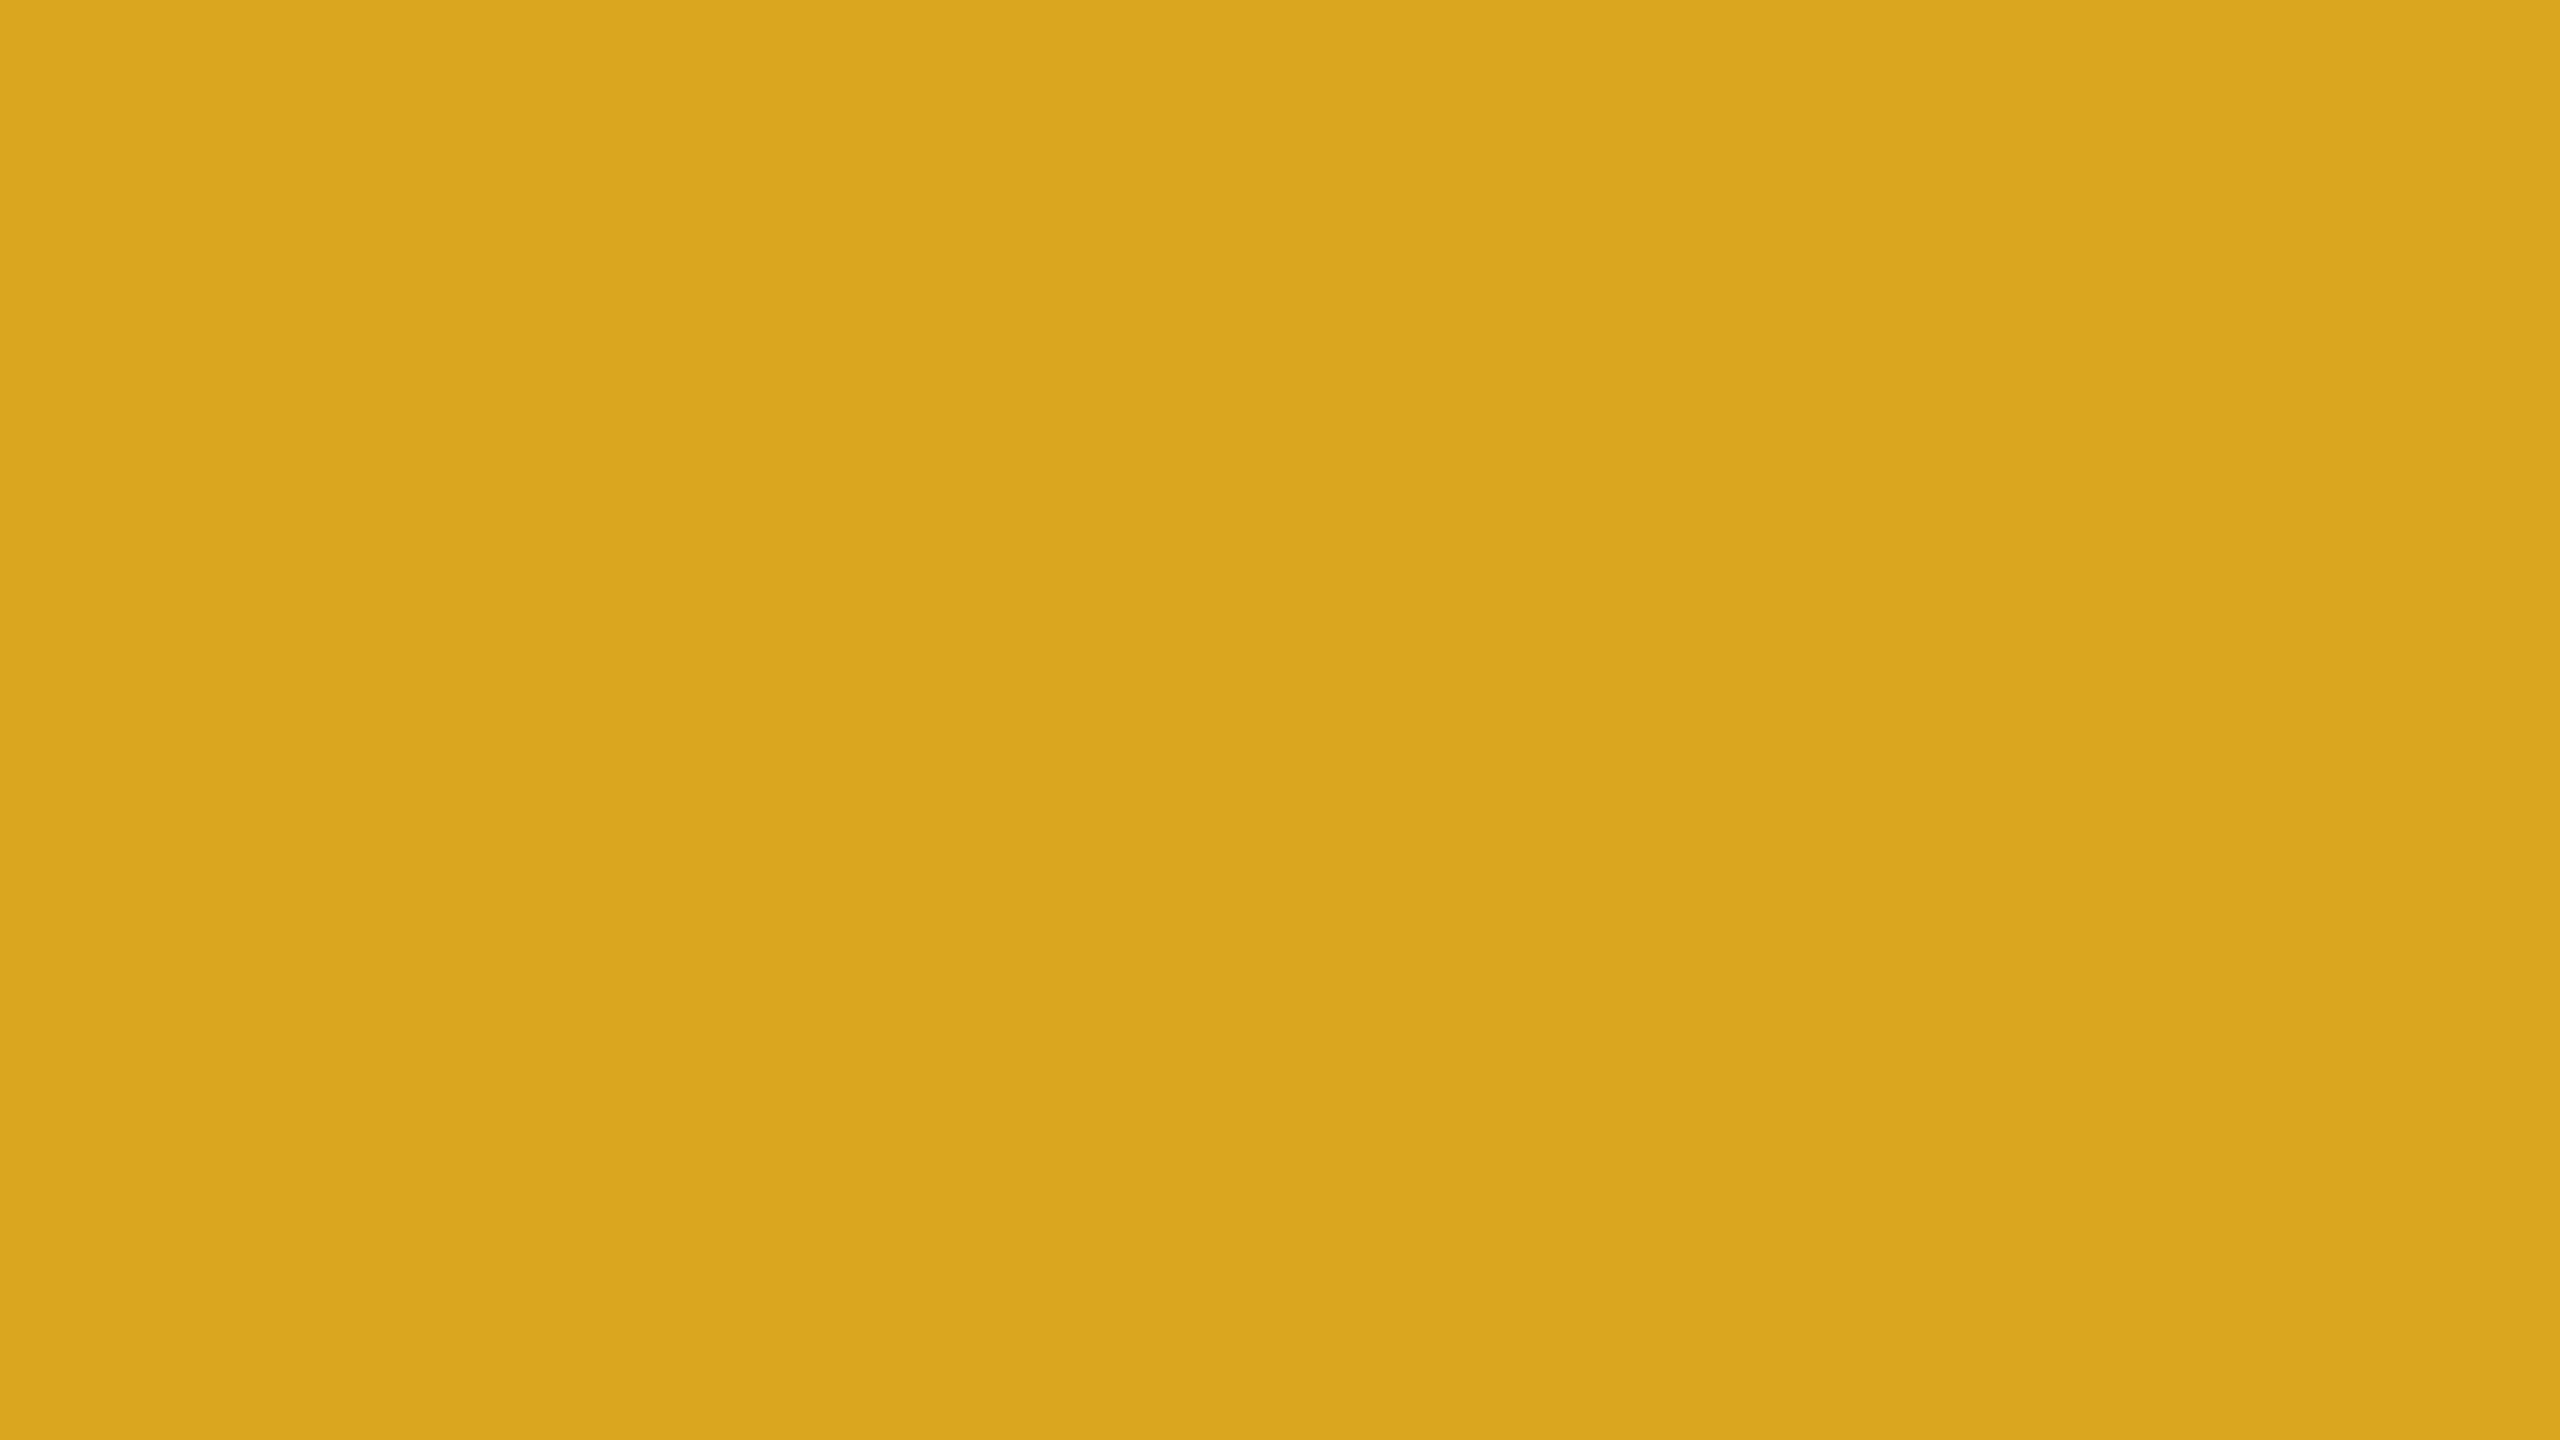 2560x1440 Goldenrod Solid Color Background